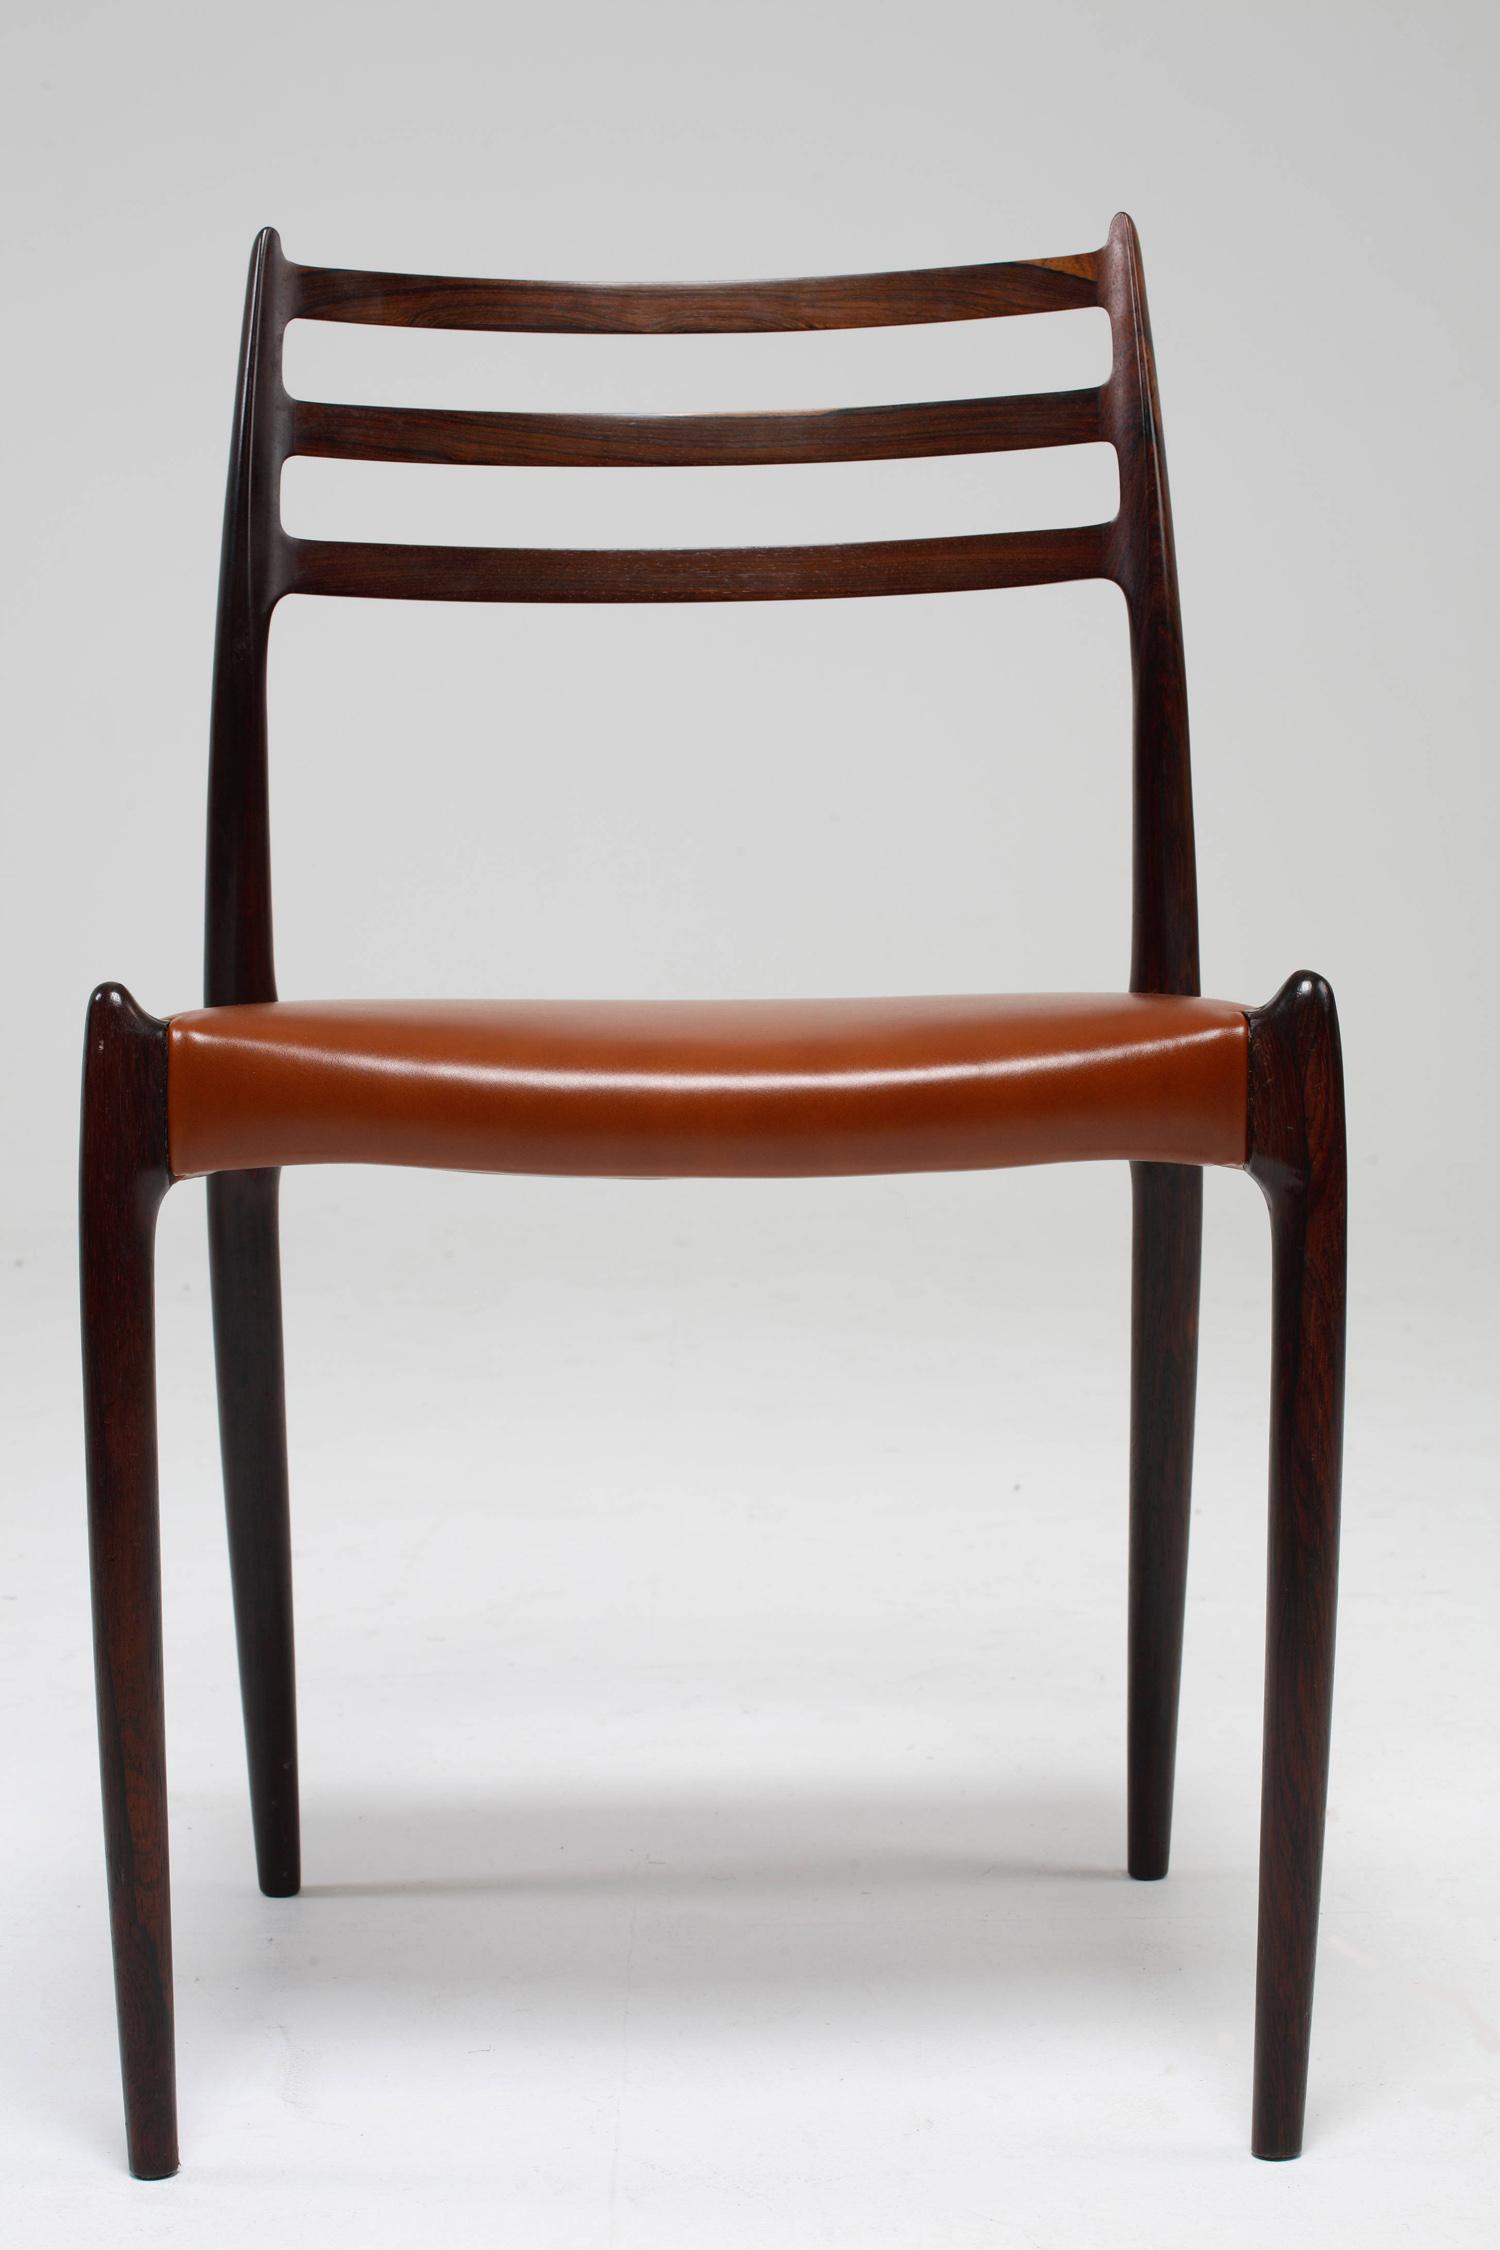 Chair_4_001_resize.jpg